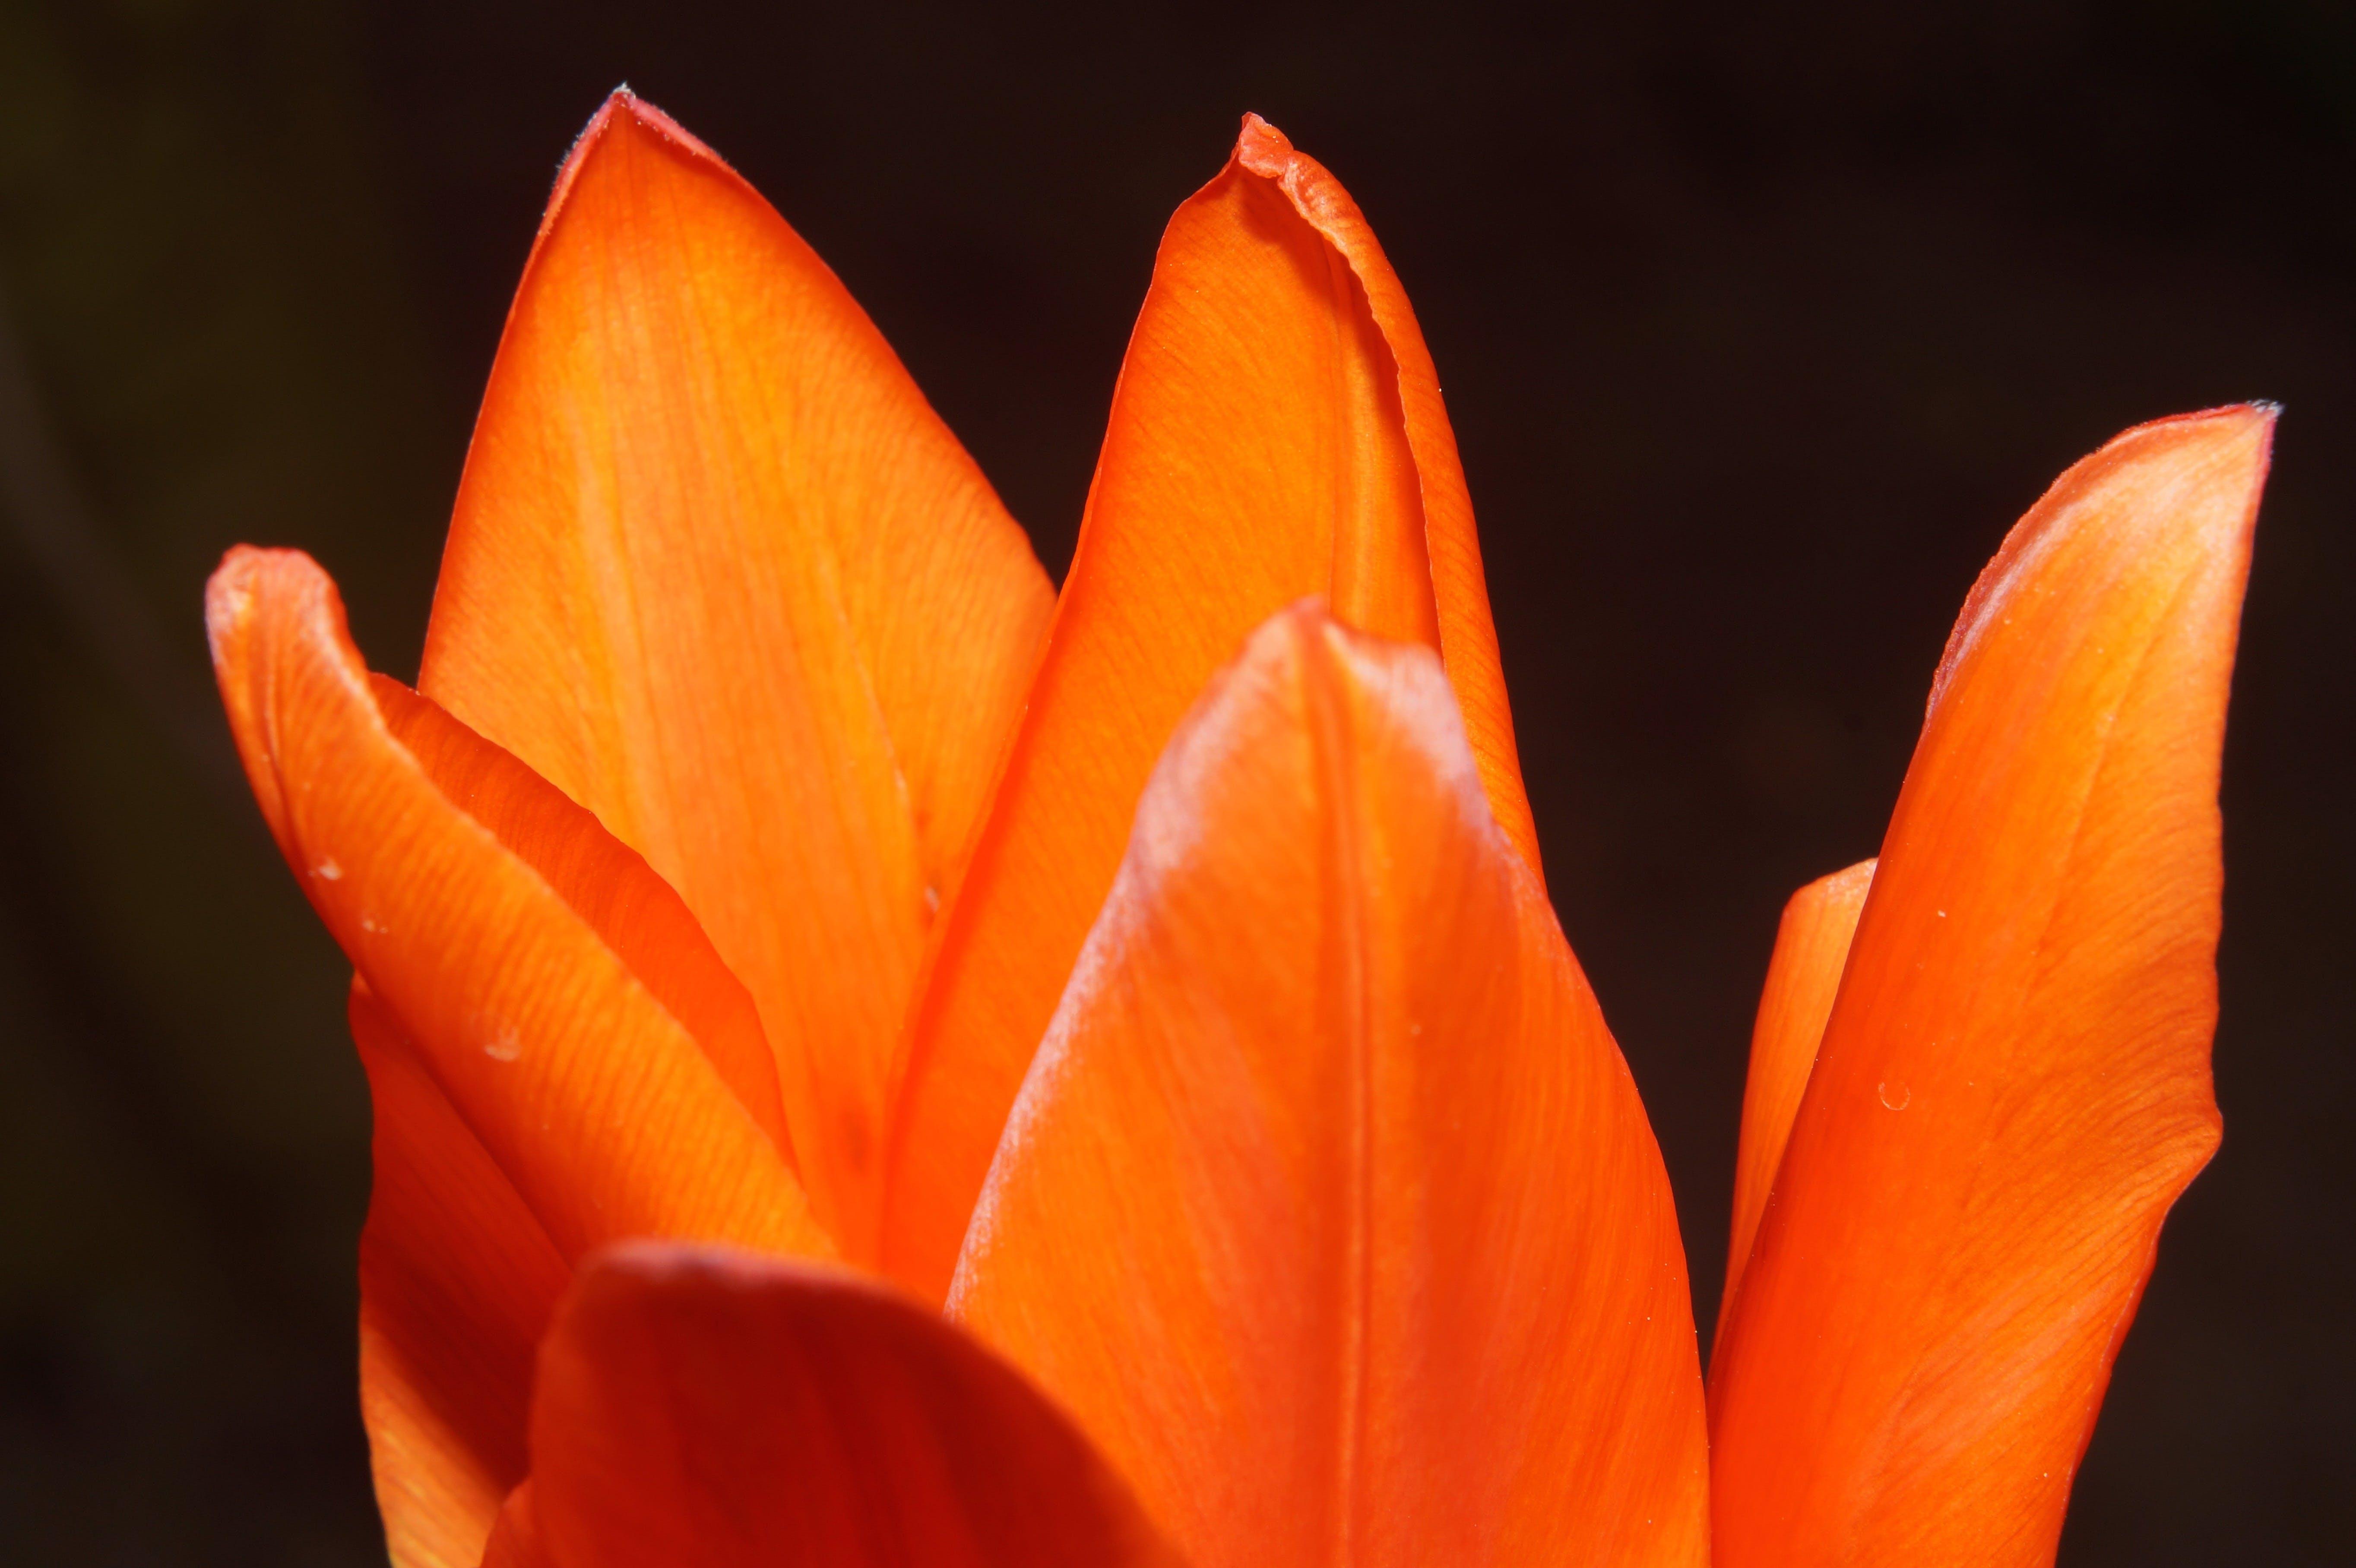 Orange Flower in Bloom